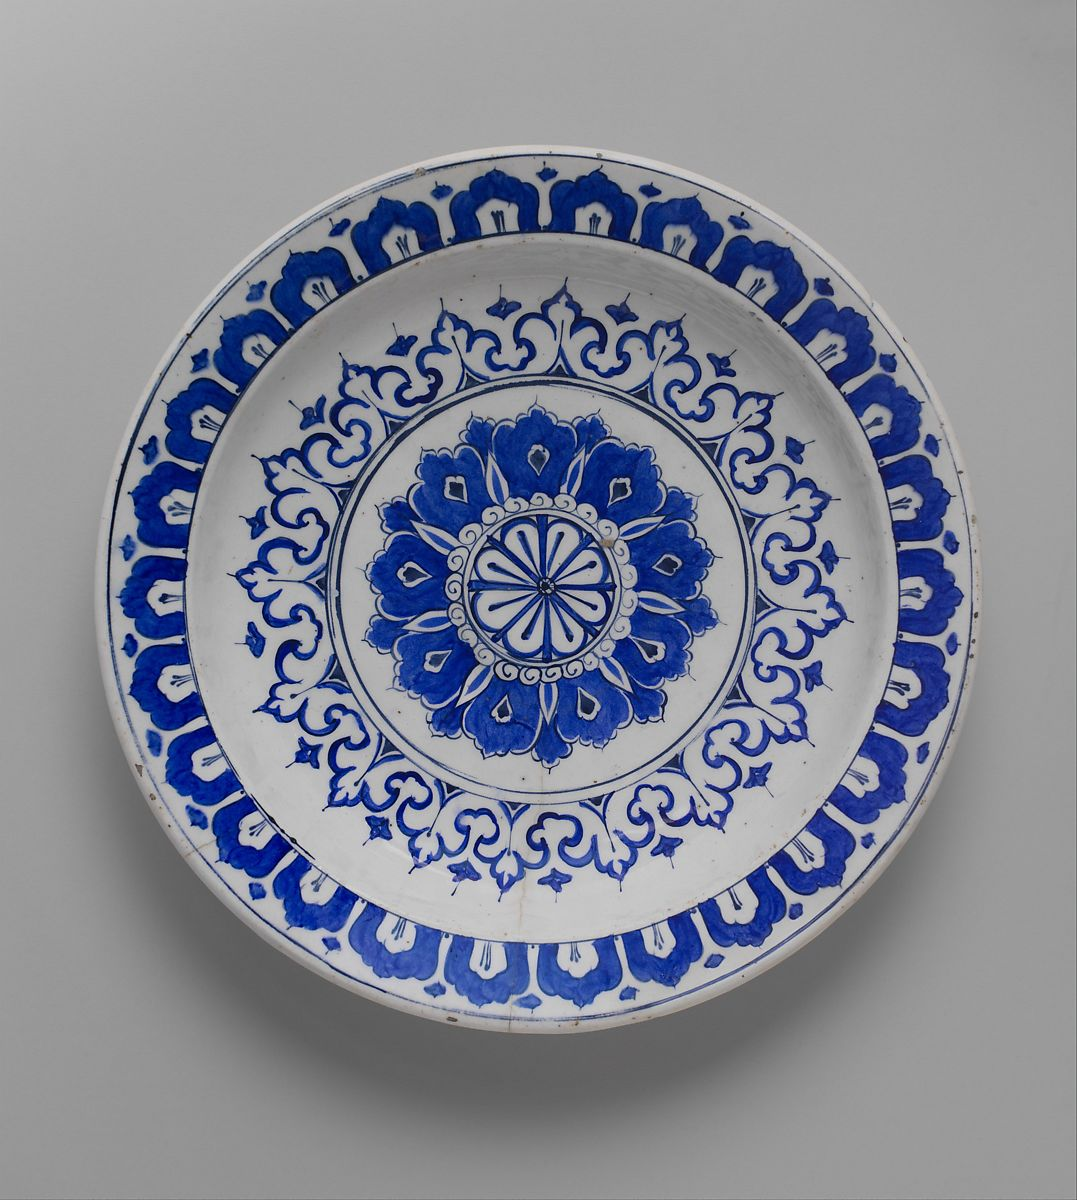 Kaleidoscope Ca: Dish With 'Kaleidoscope' Design